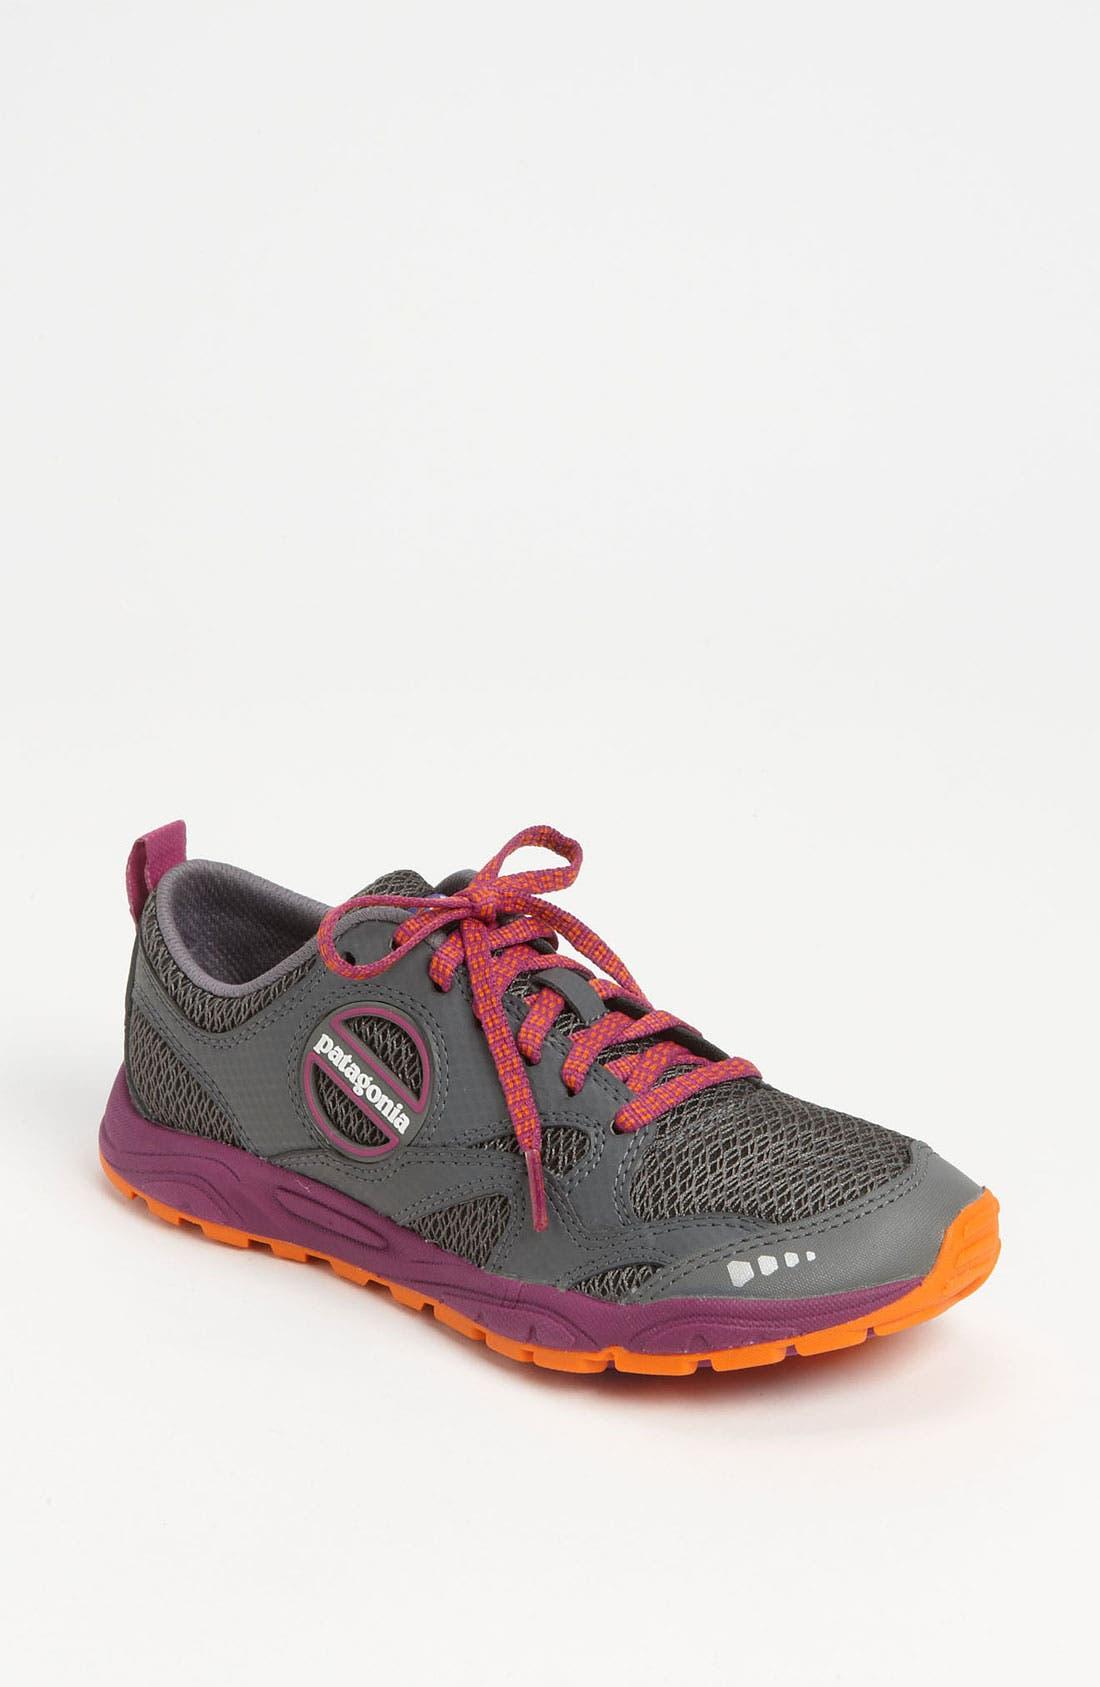 Main Image - Patagonia 'EVERmore' Running Shoe (Women)